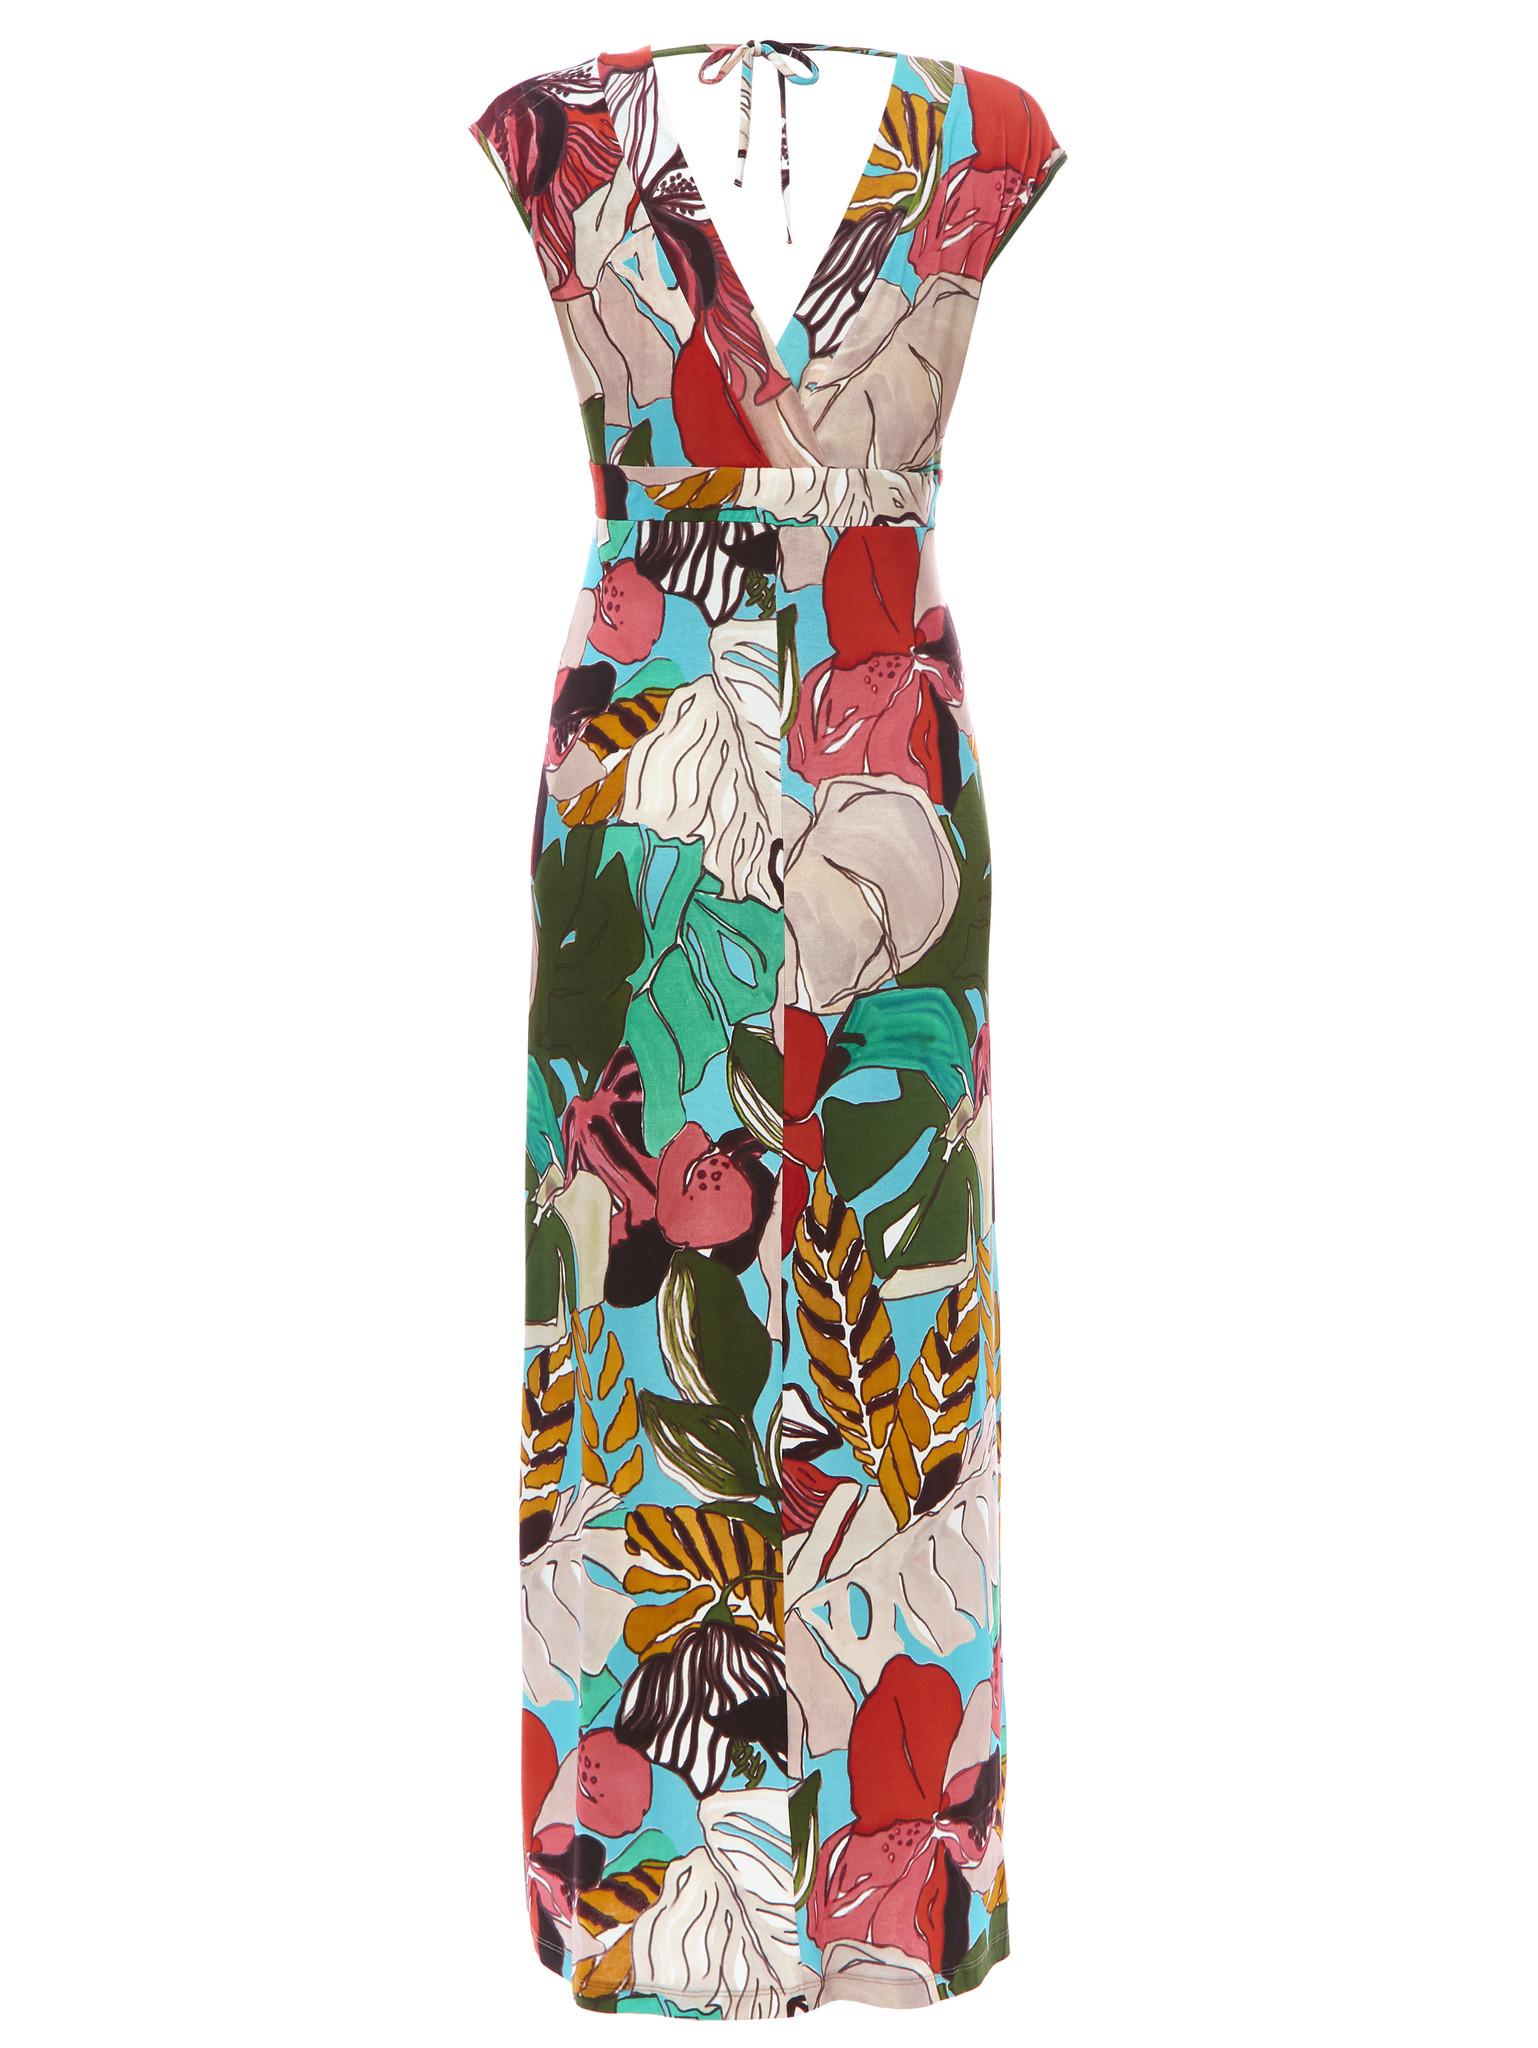 TESSA KOOPS MEGHAN MALAGA DRESS